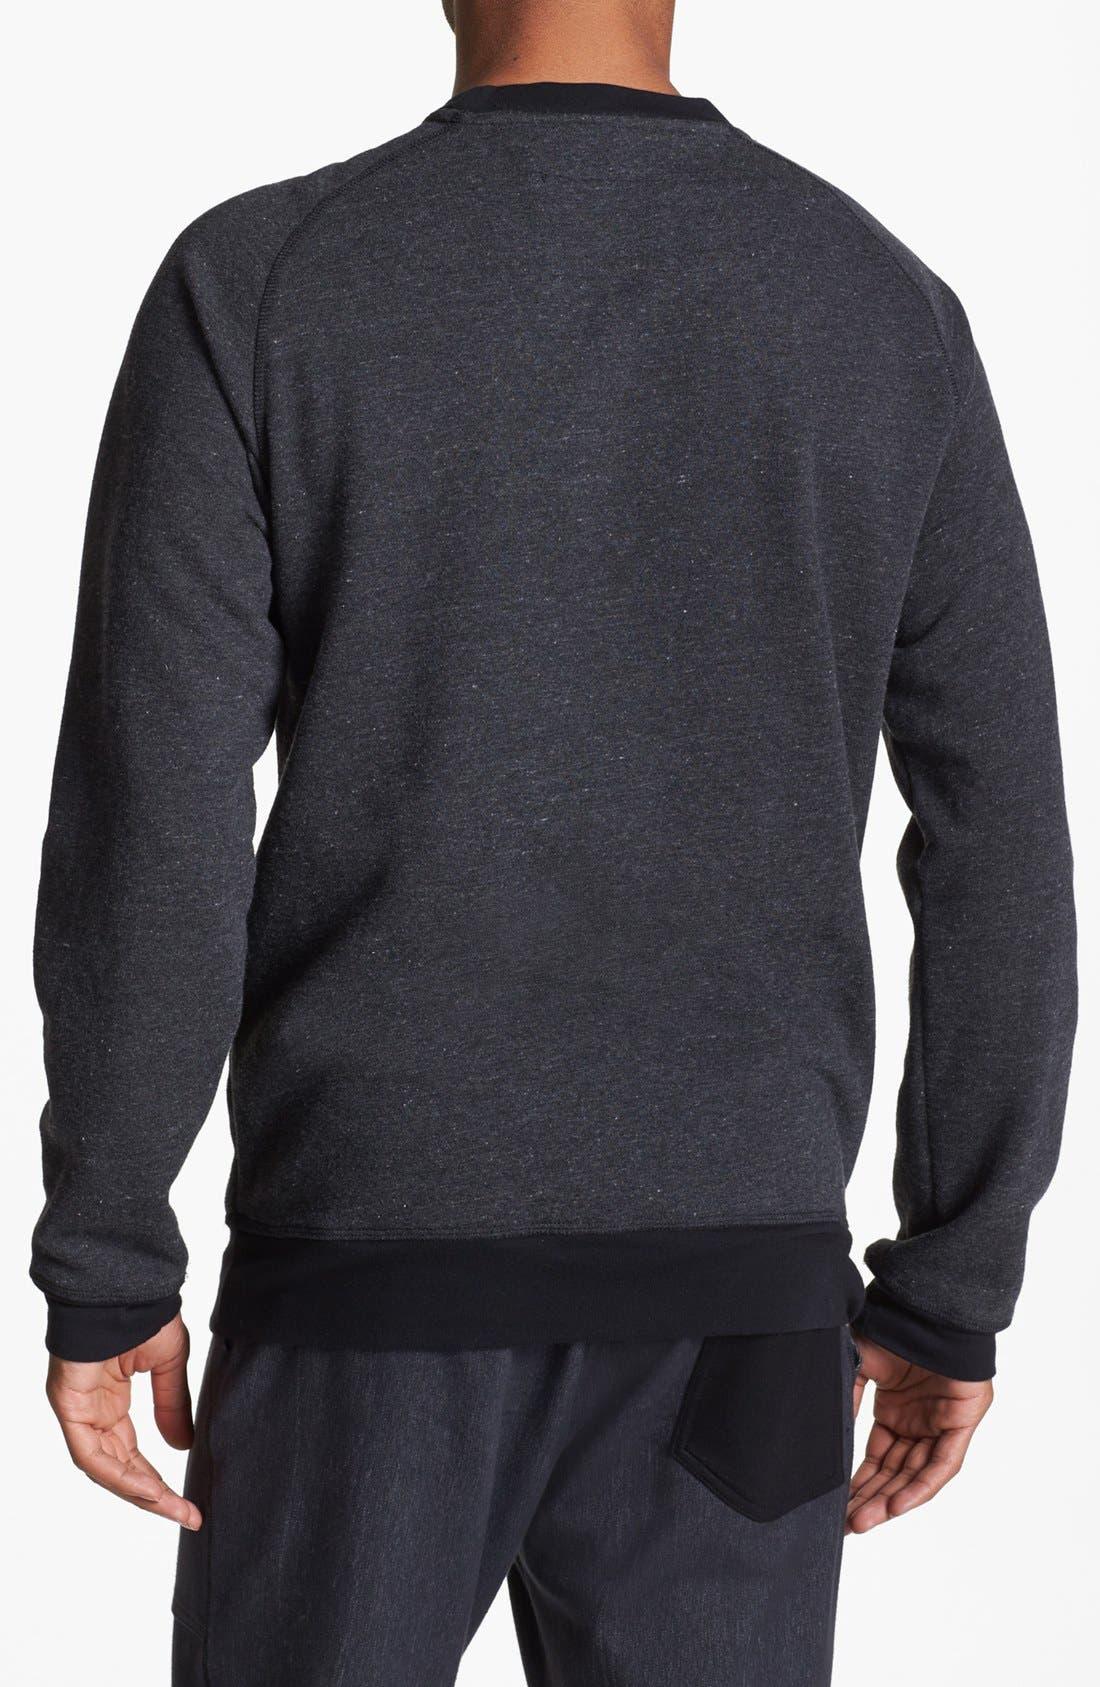 Alternate Image 2  - UNCL Raglan Crewneck Sweater